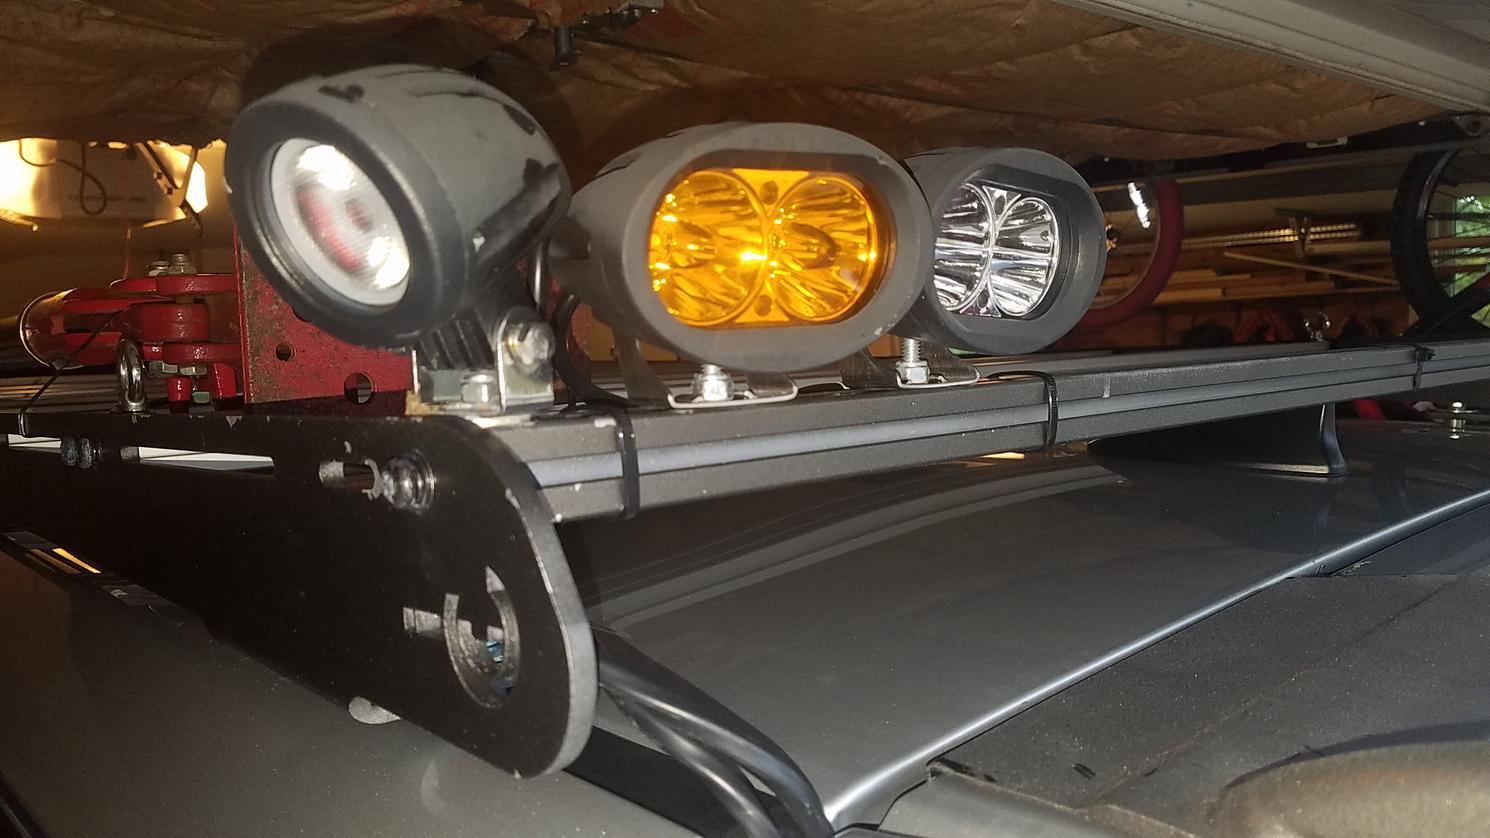 Rear Facing Light - Prinsu - Toyota 4Runner Forum - Largest 4Runner